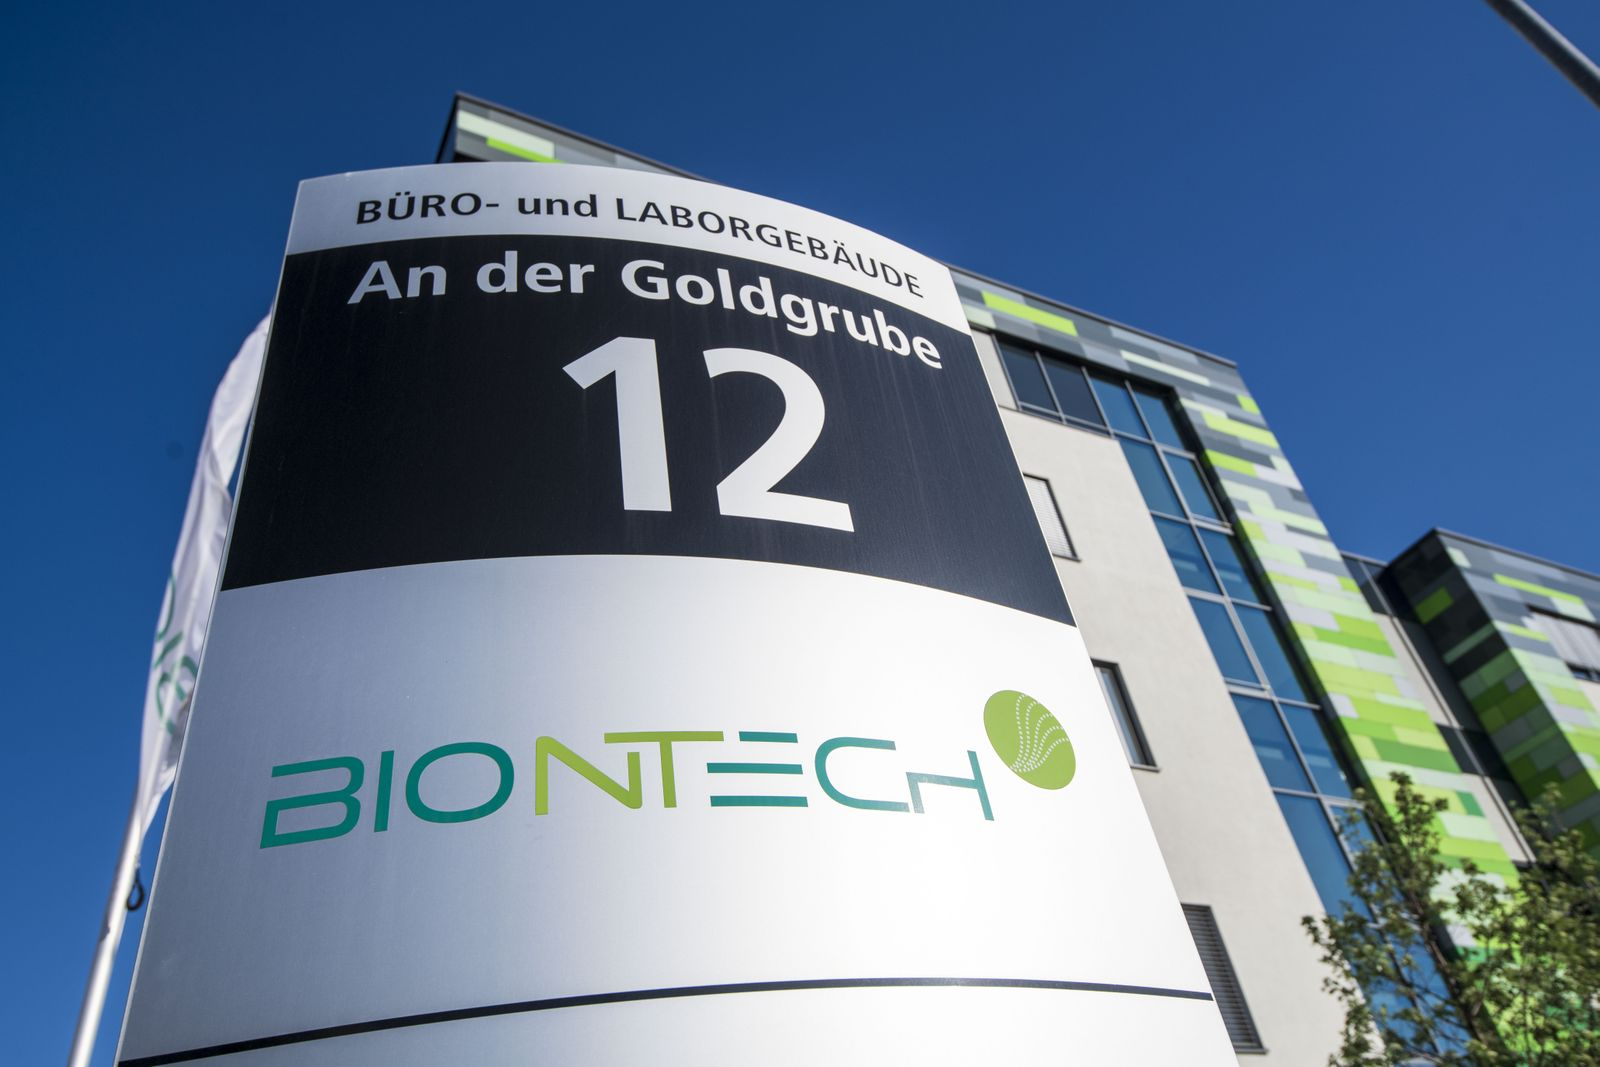 Biontech / Zentrale